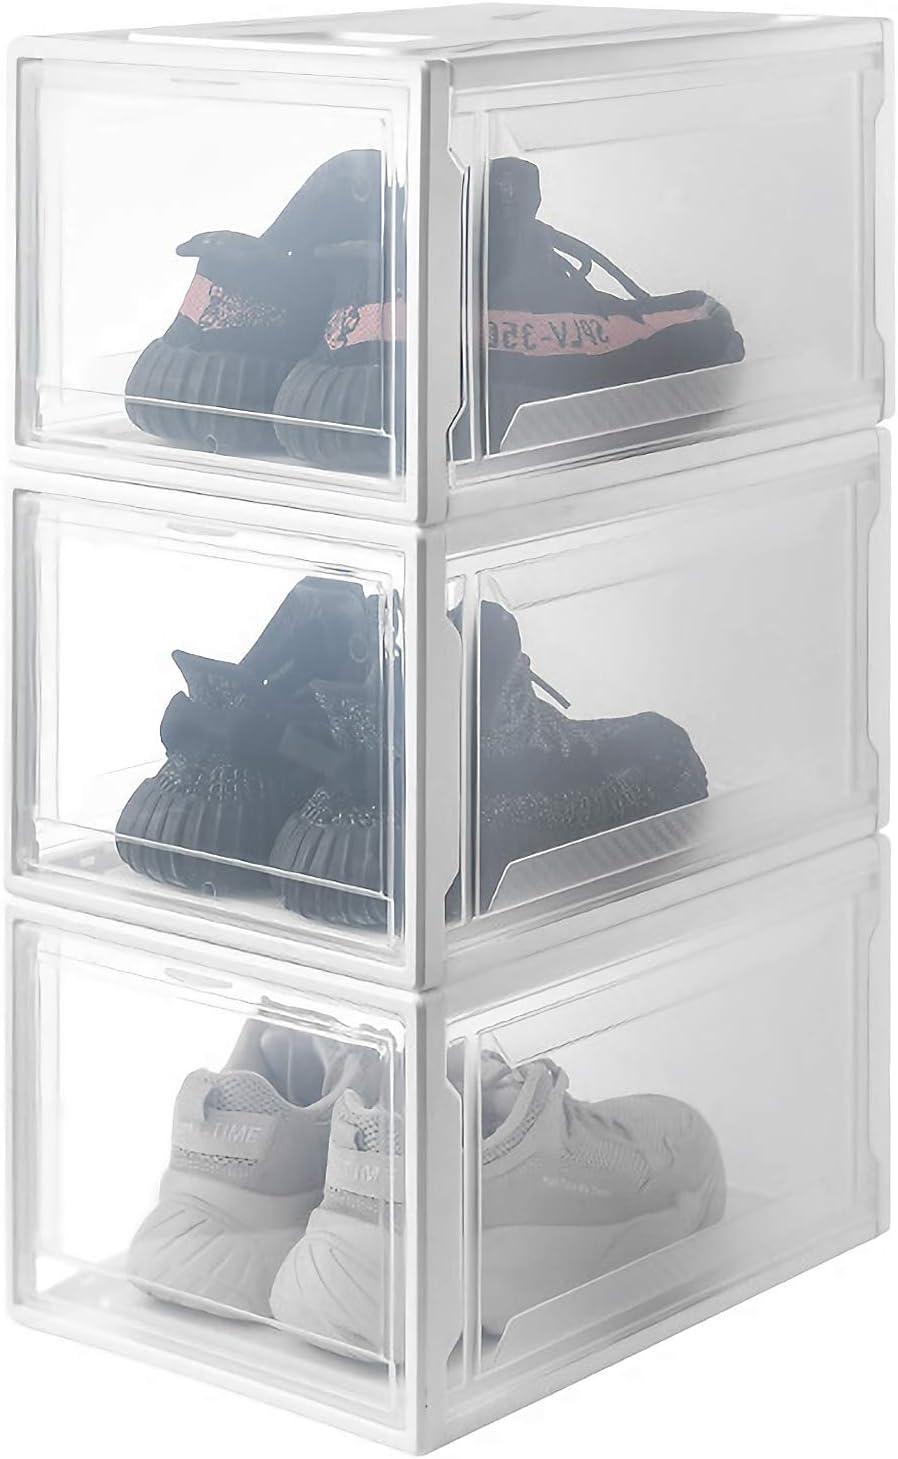 Yorbay Shoe Storage Box, 3pcs Stackable Shoe Organiser Boxes, Plastic Clear Door 26x37x20cm, for Ladies Men Shoes Up to UK Size 13 Reusable (White)